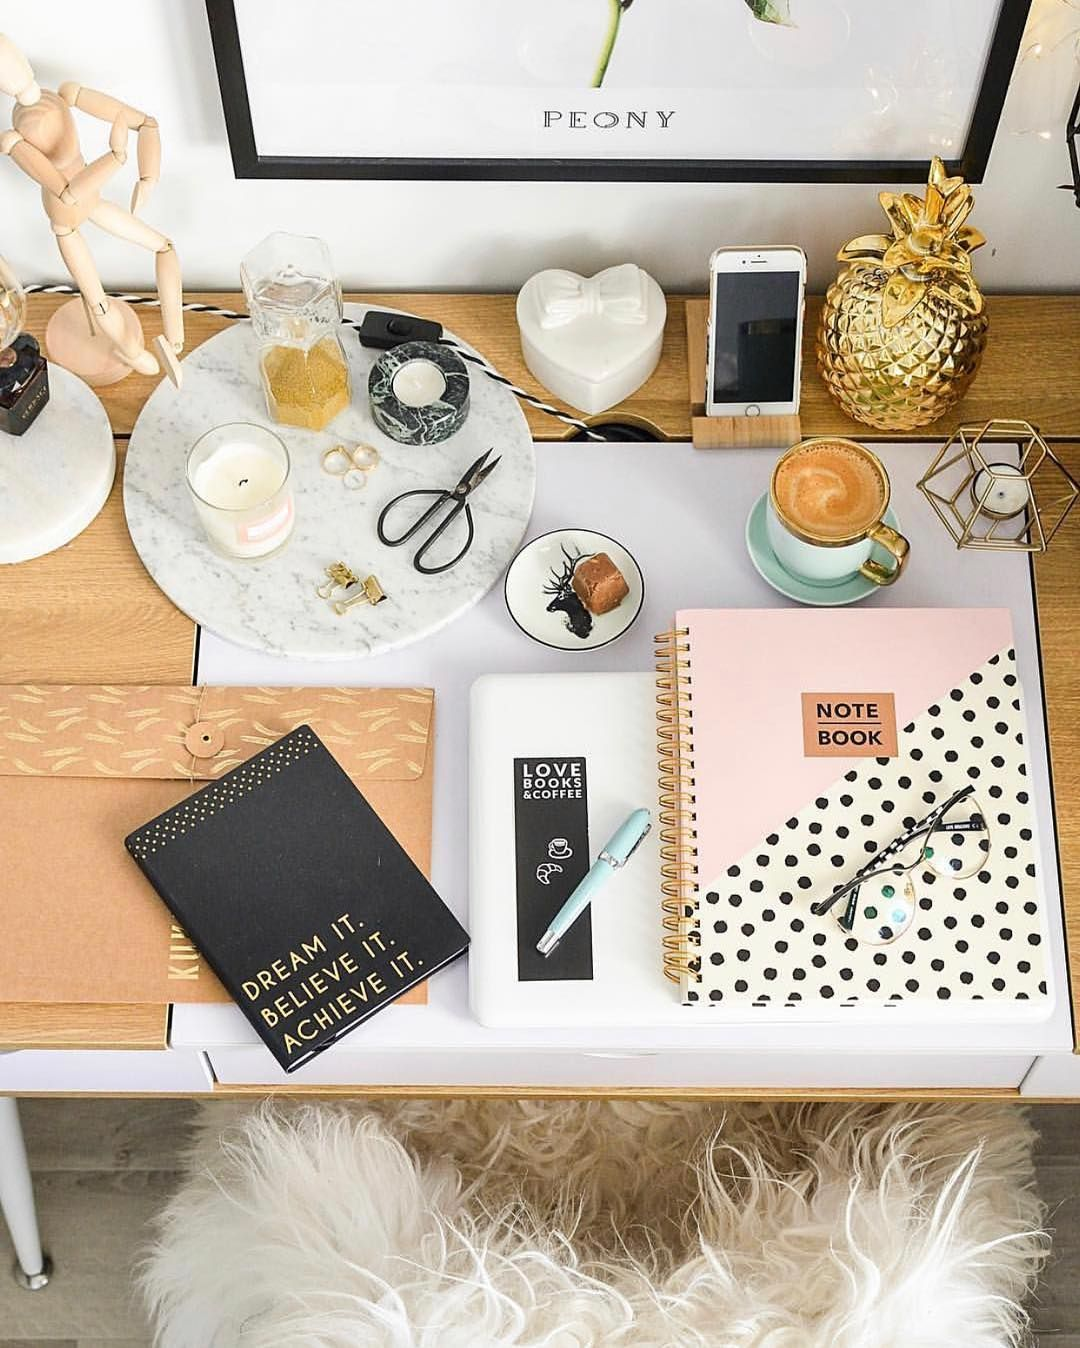 Diy Homeoffice Desk Ideas: Beautiful Desk Setup . . #desklifebliss #intentionalliving